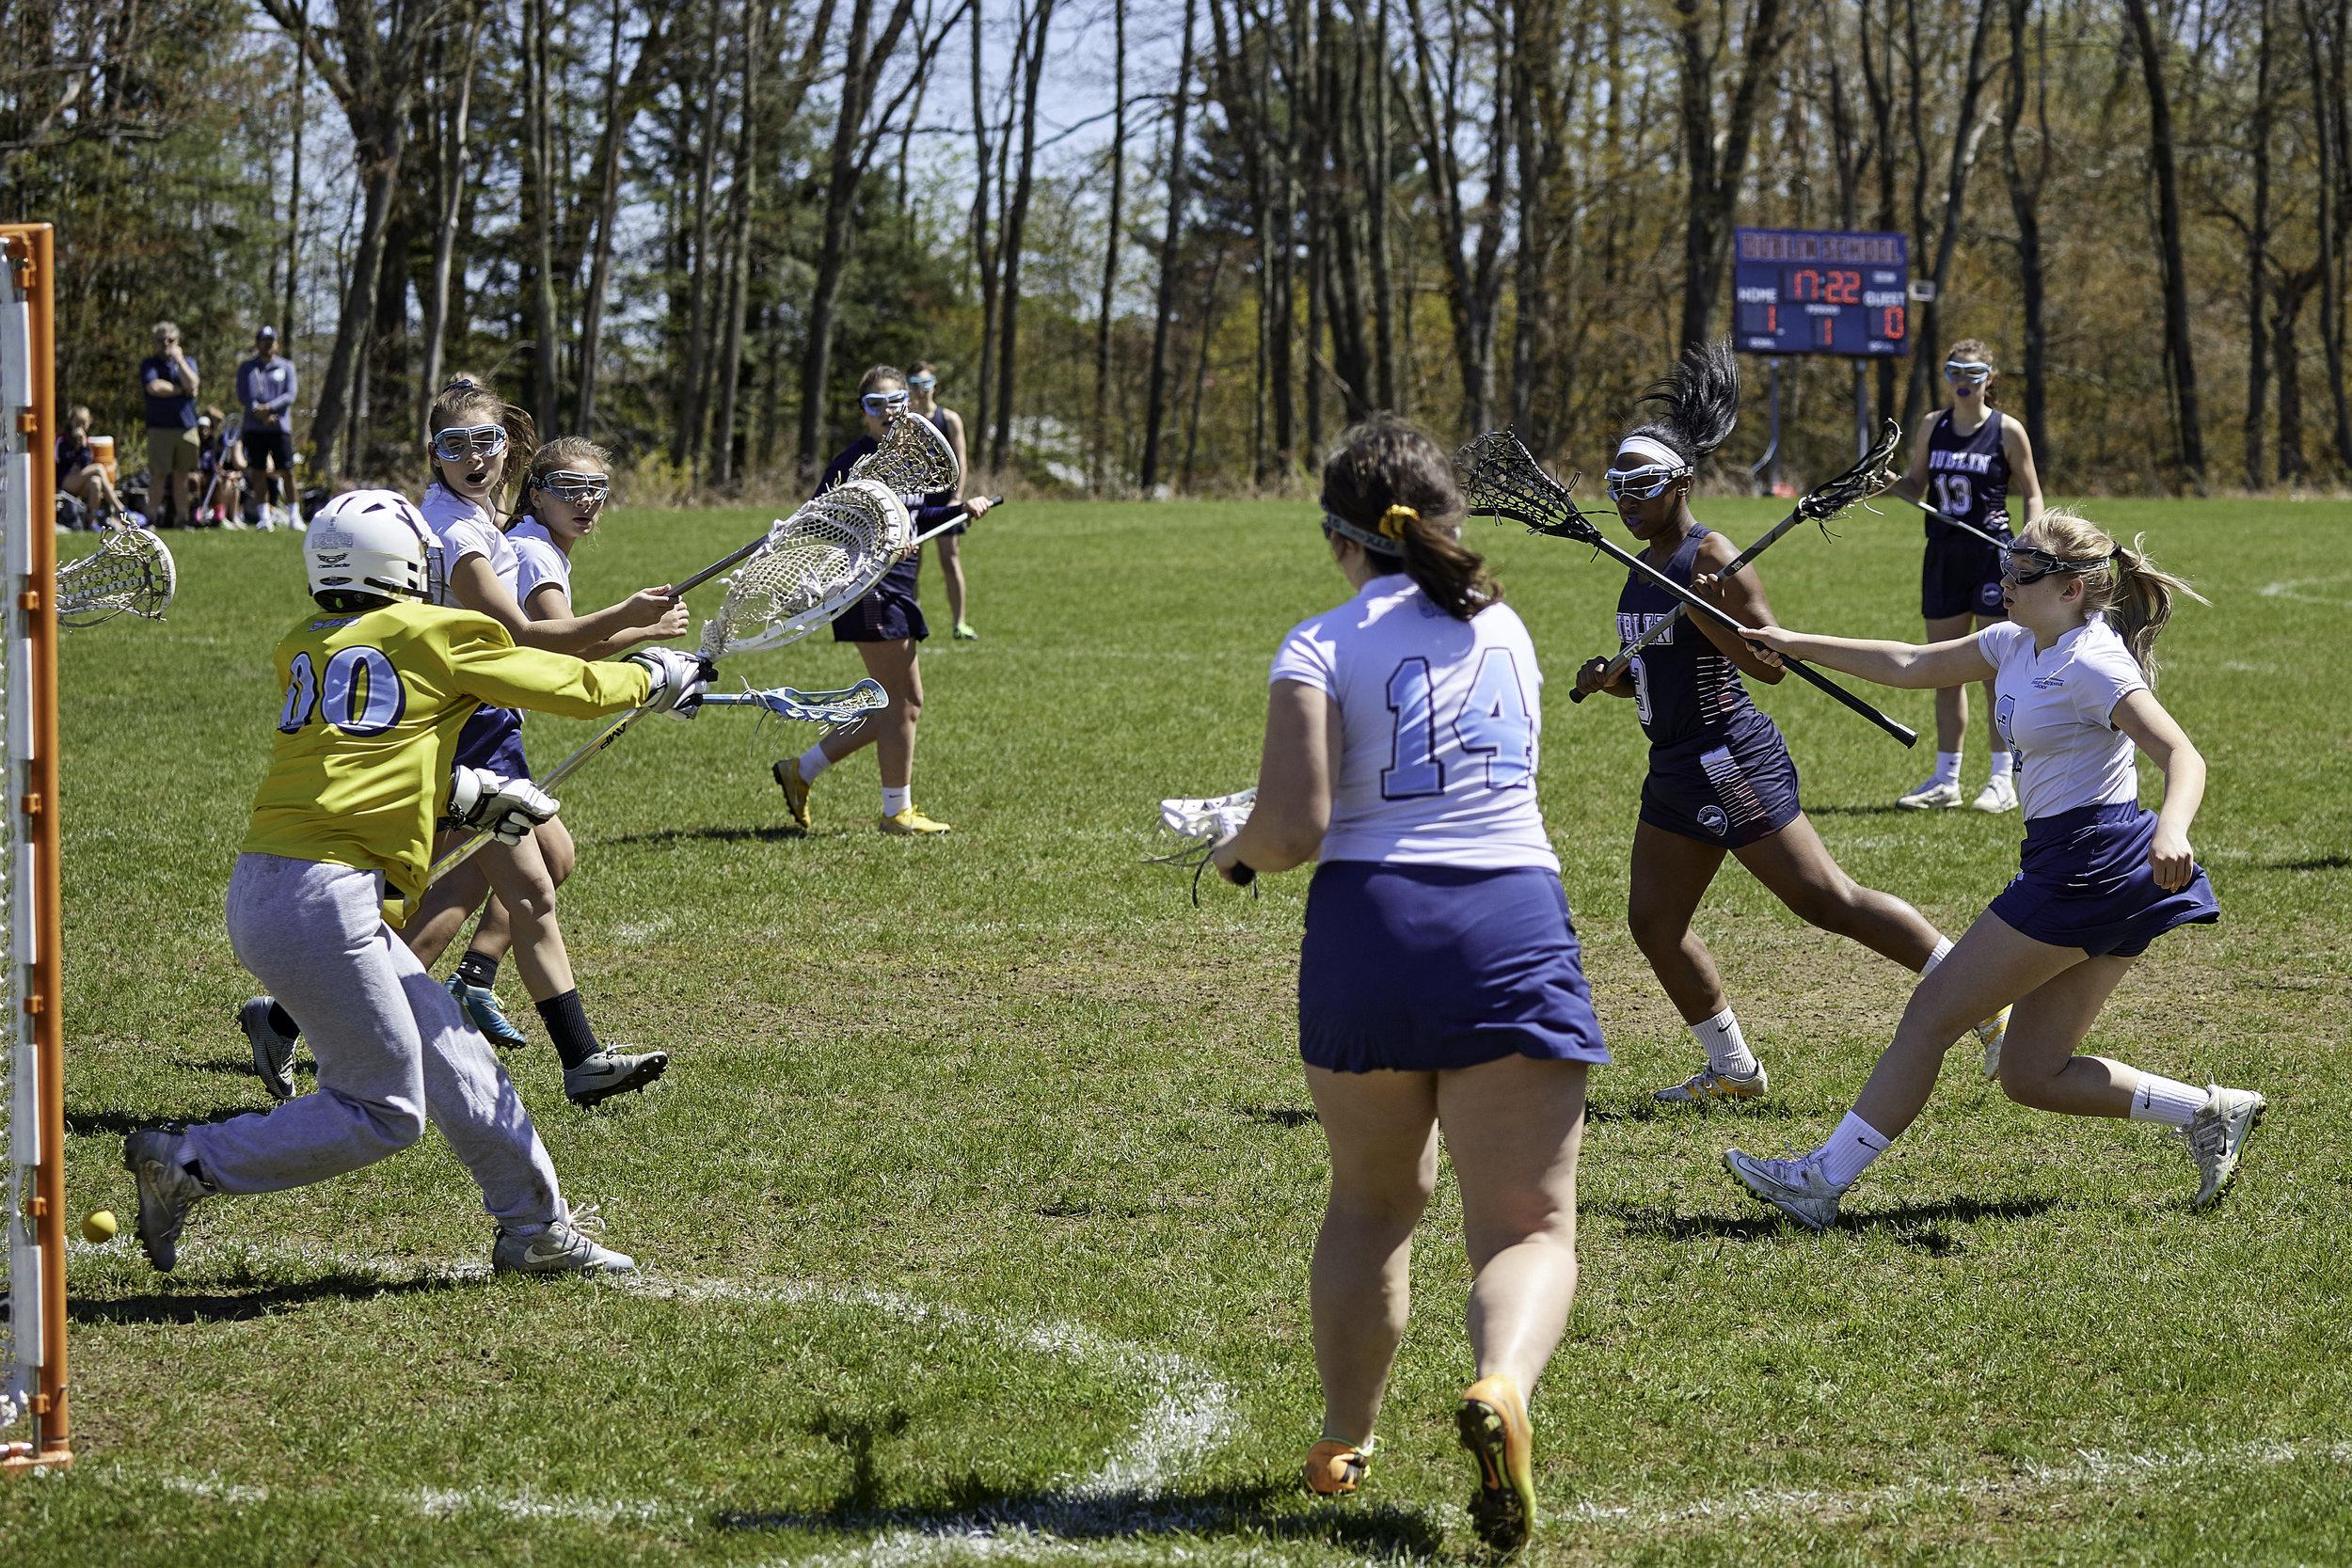 Girls Lacrosse vs. Stoneleigh Burnham School - May 11, 2019 - May 10, 2019193133.jpg